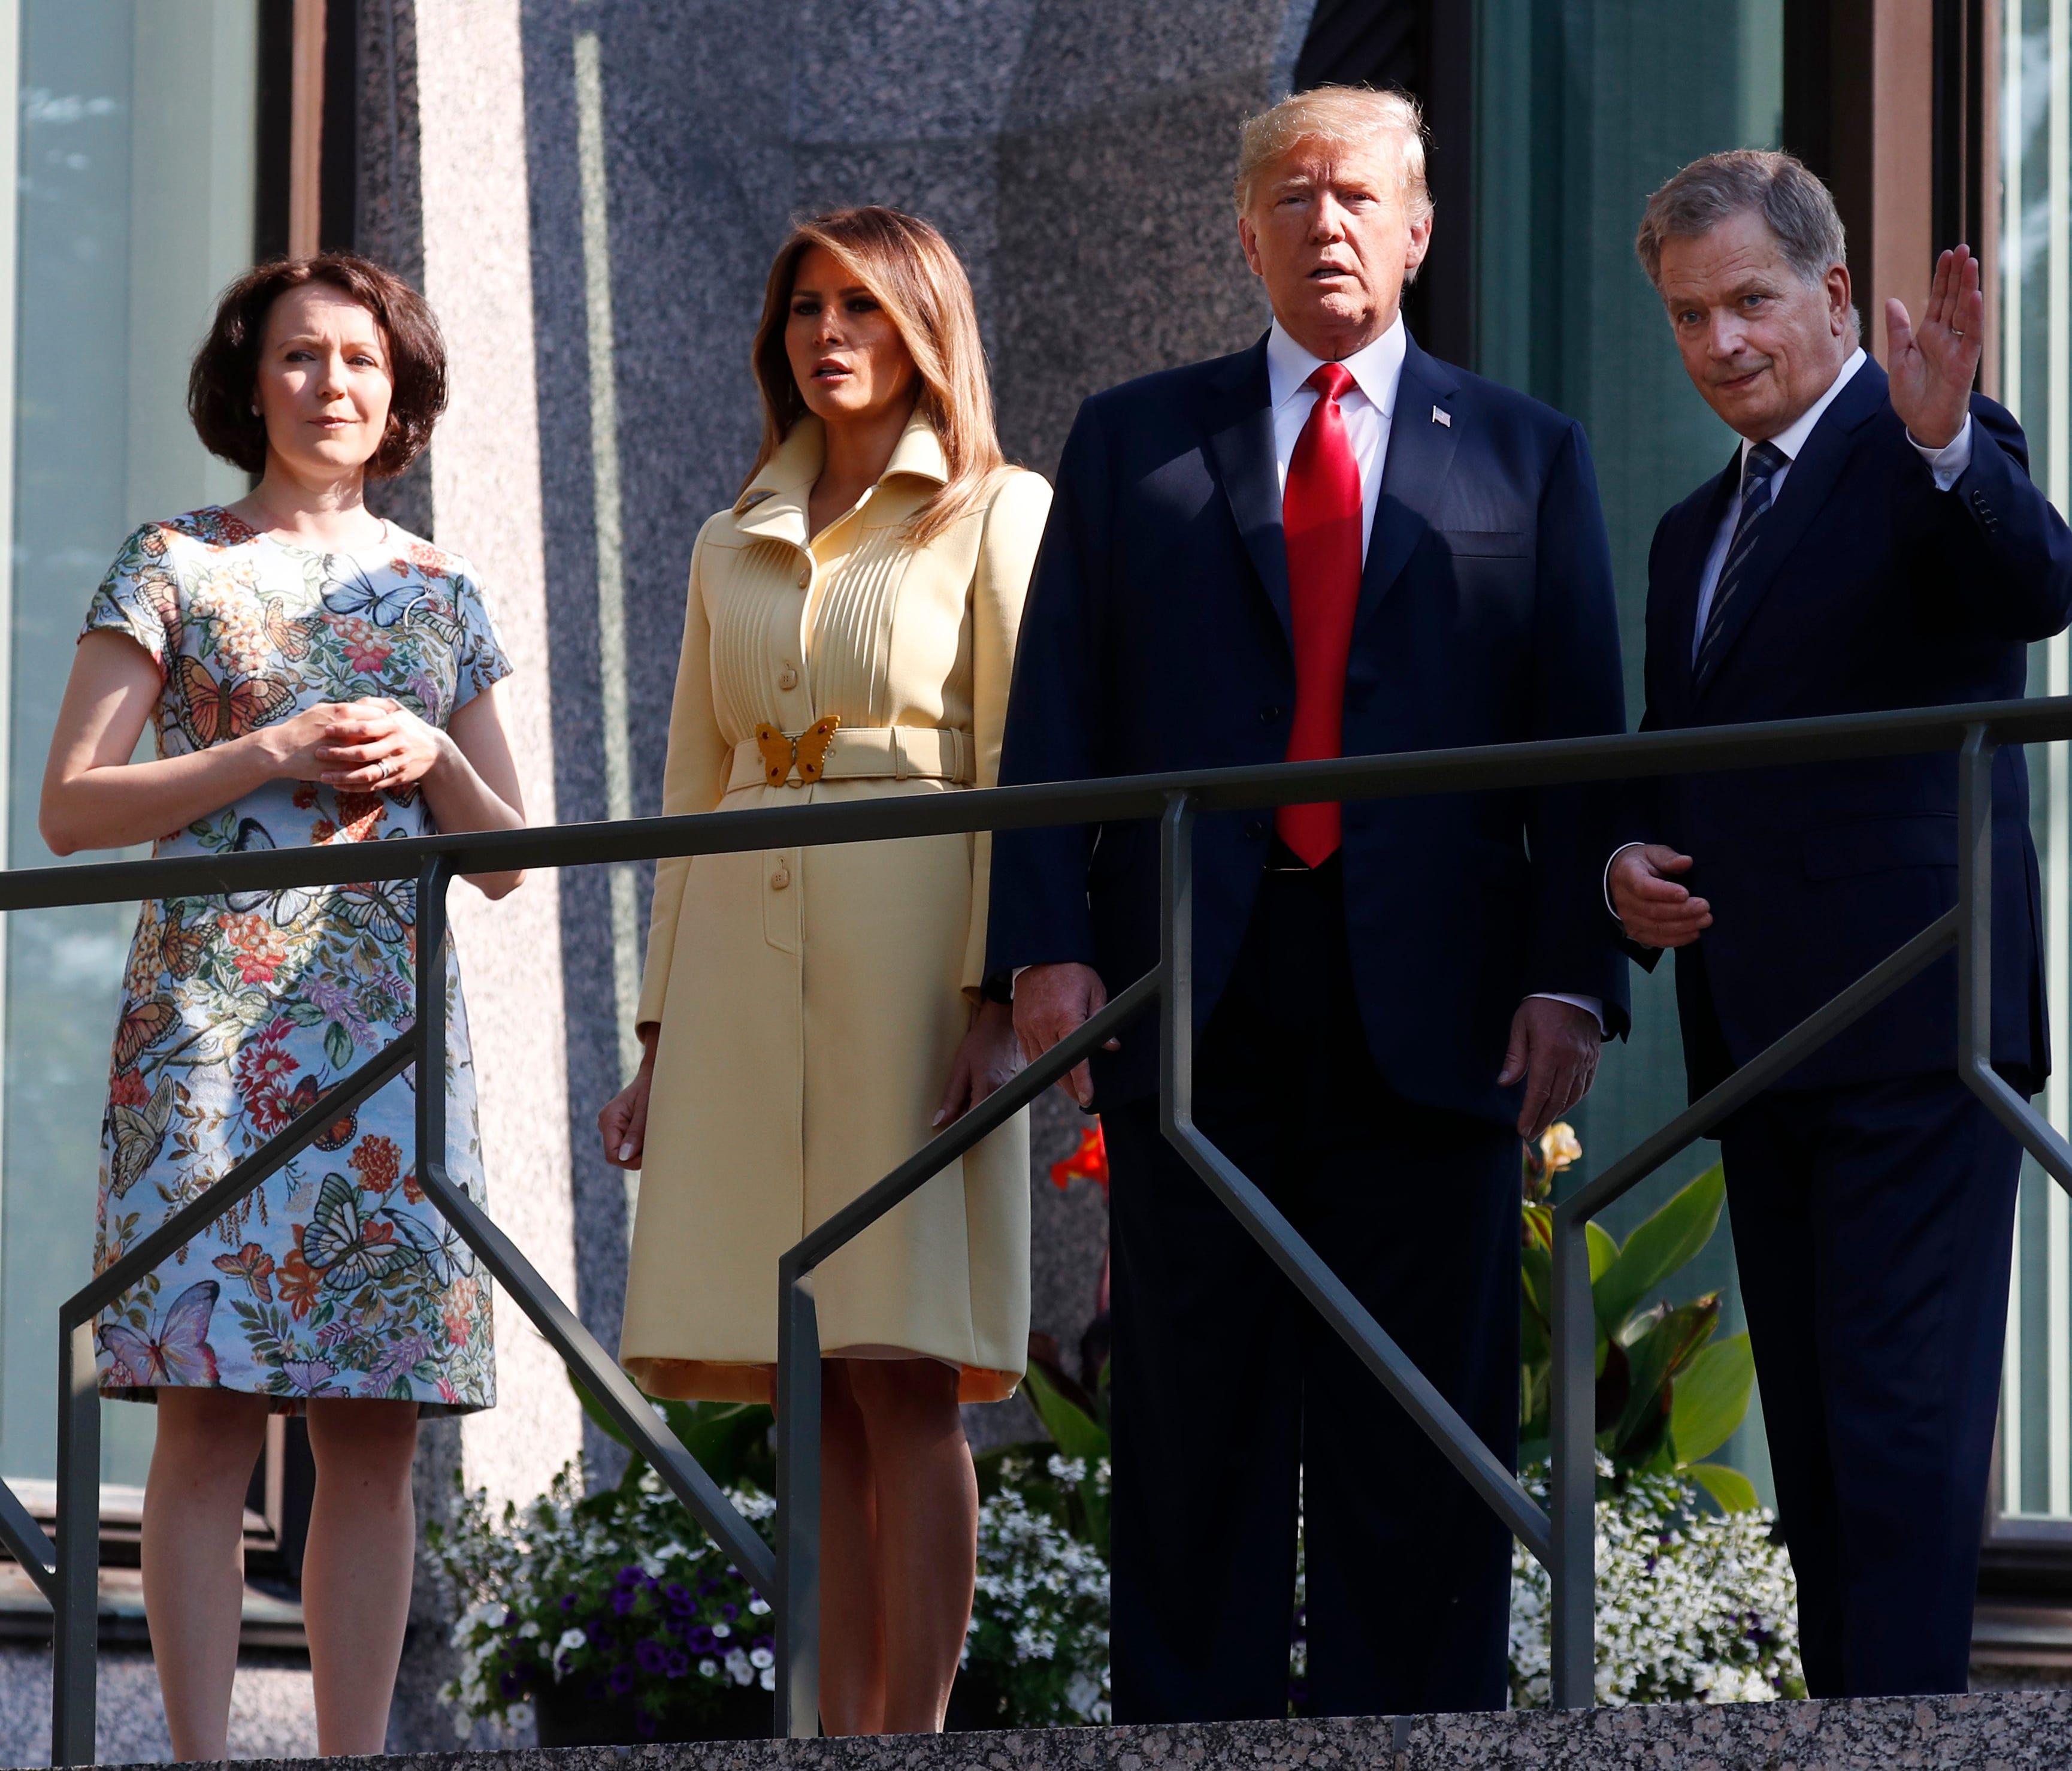 Jenni Haukio, wife of Finnish President Sauli Niinisto, U.S. First Lady Melania Trump and President Trump and Finnish President Sauli Niinisto, from left, on the balcony of Niinisto's official residence in Helsinki on Monday.